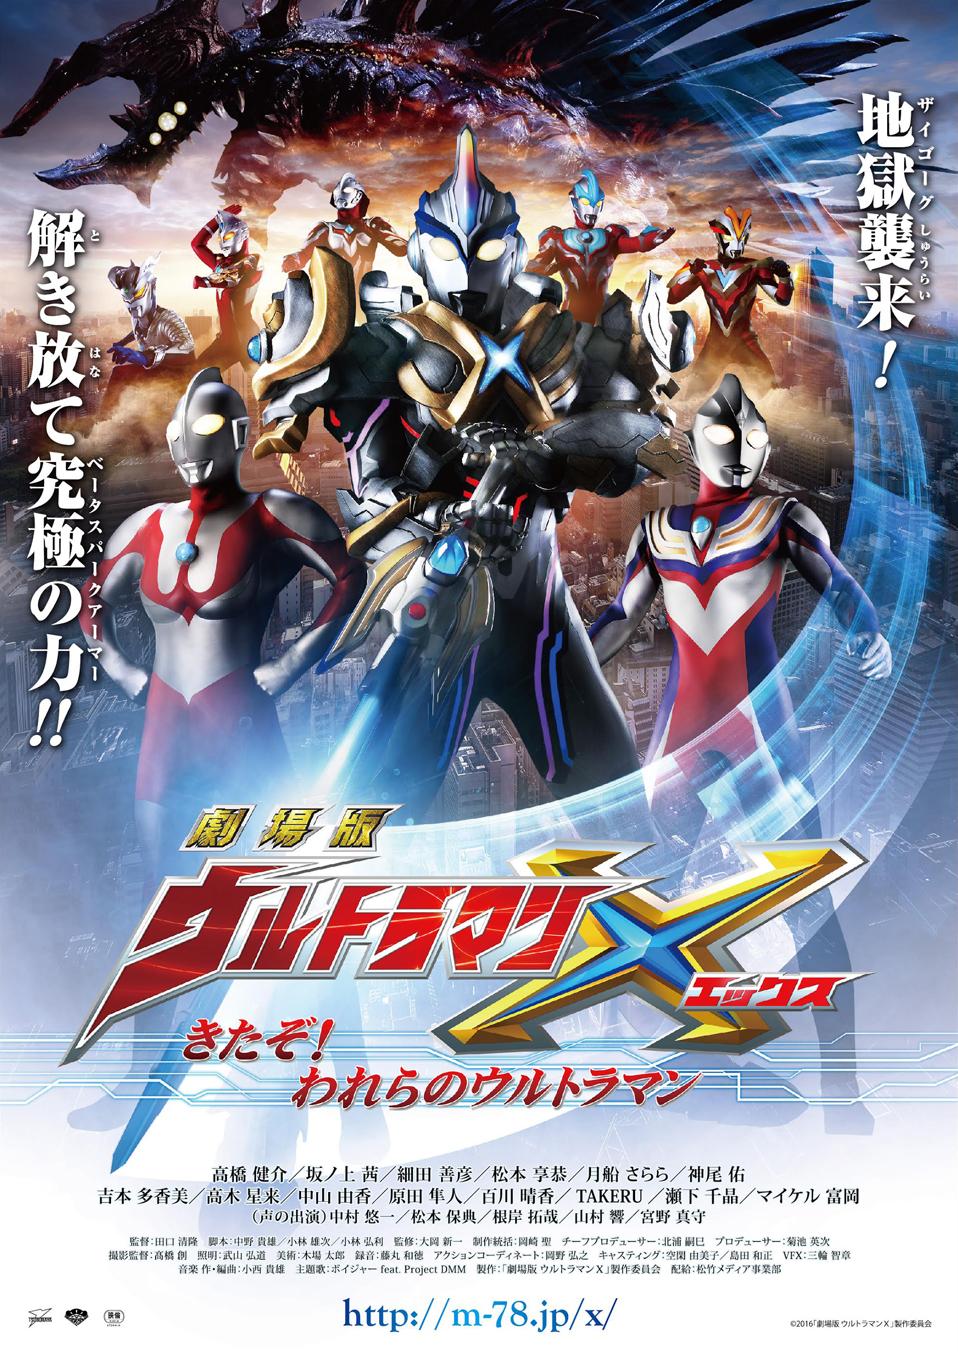 FigureGunplaFan/Ultraman Ginga X & Ultraman X Movies gets a limited theatrical release in the US!